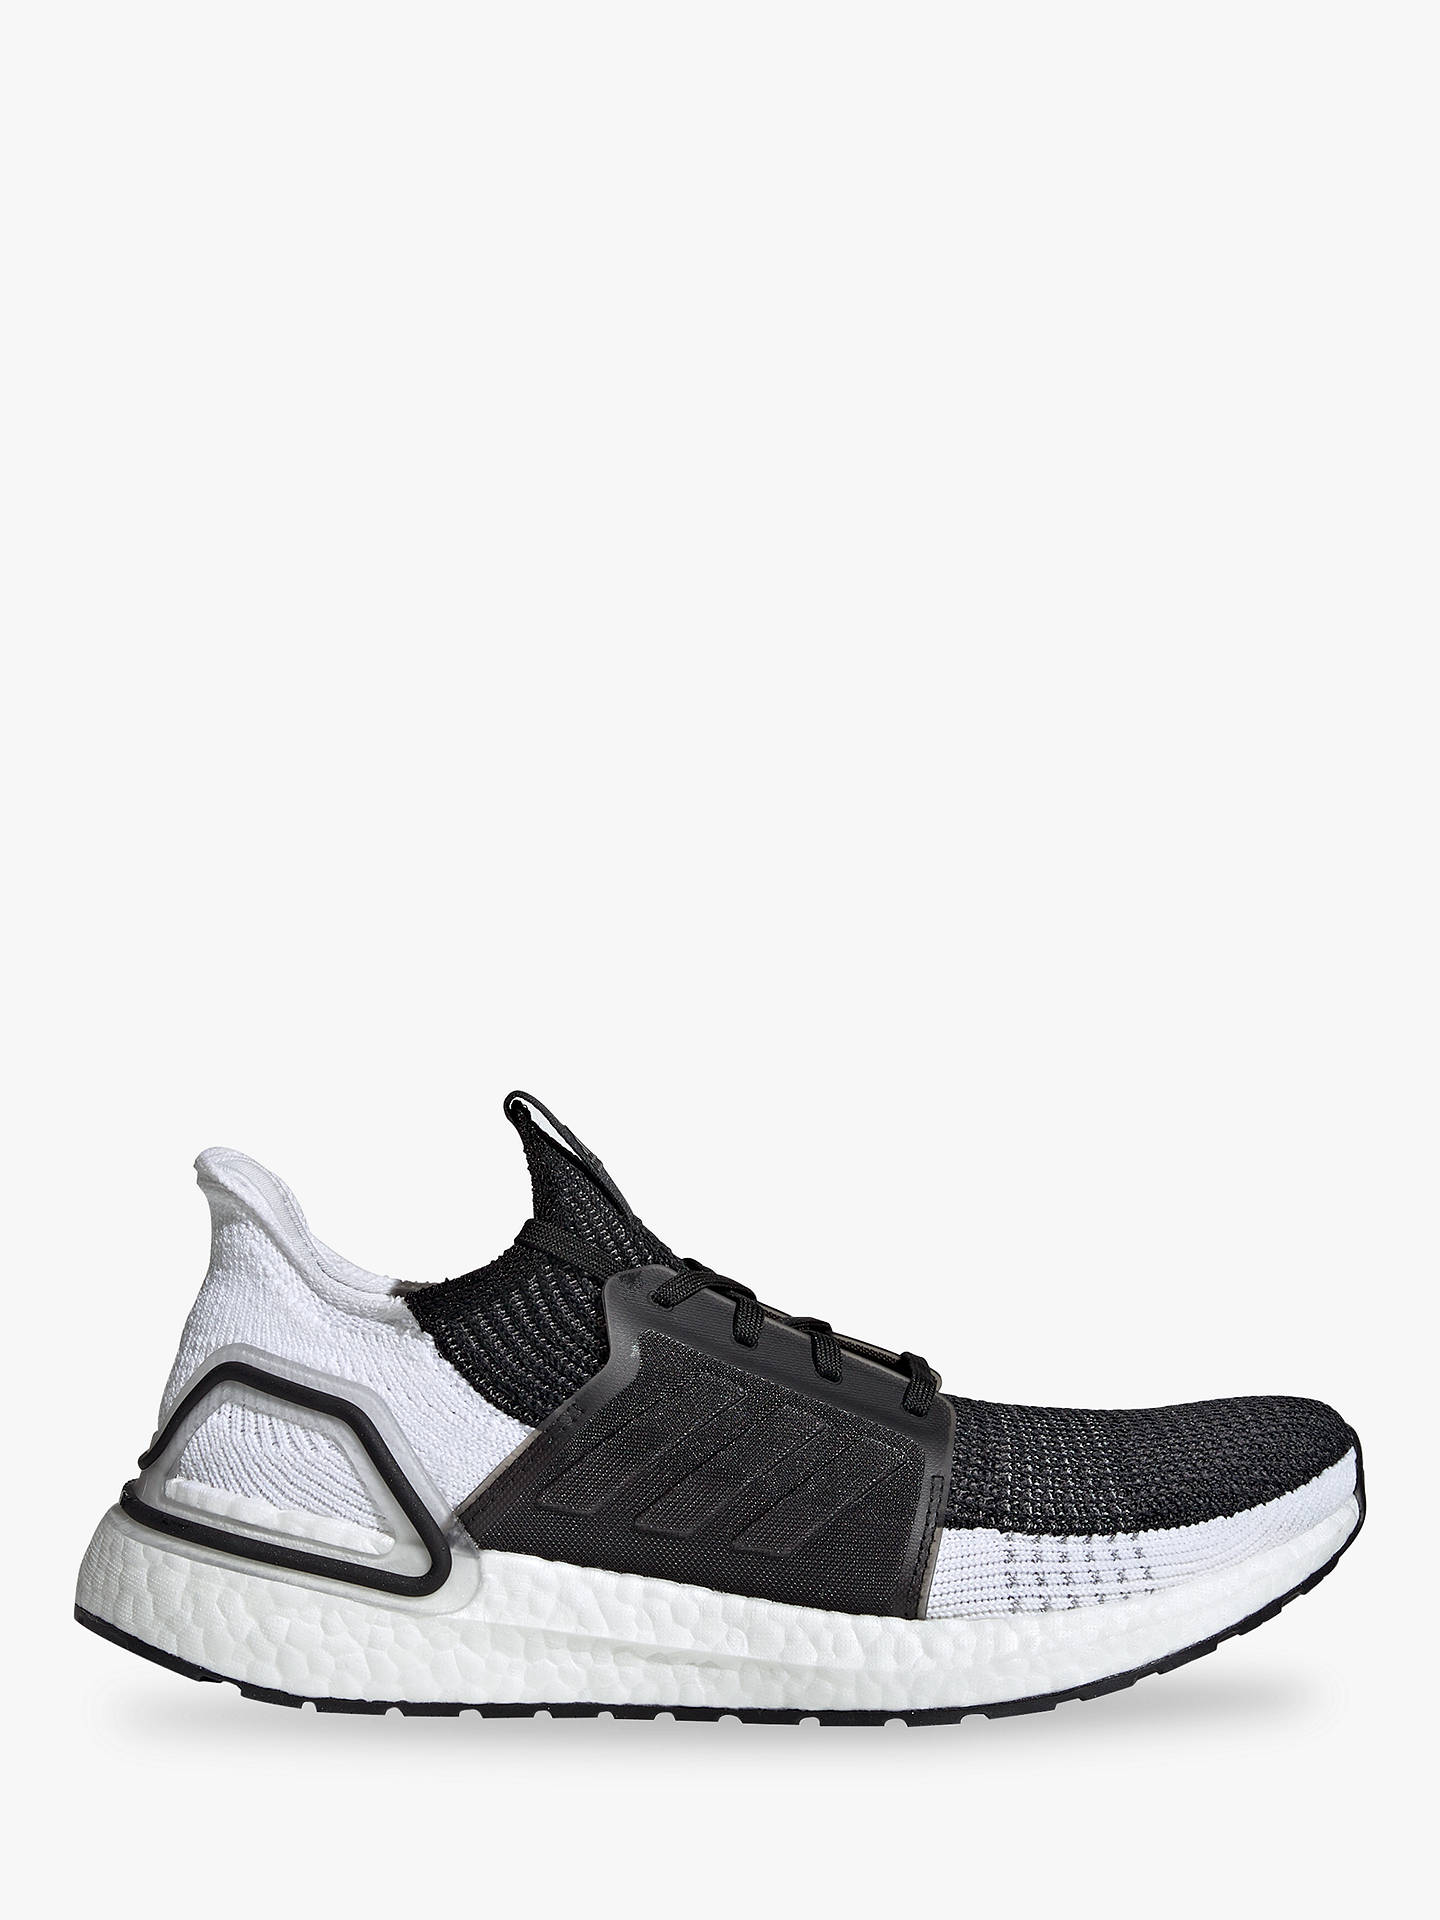 6baf49461f4 adidas UltraBOOST 19 Men's Running Shoes, Core Black/Grey Six at ...